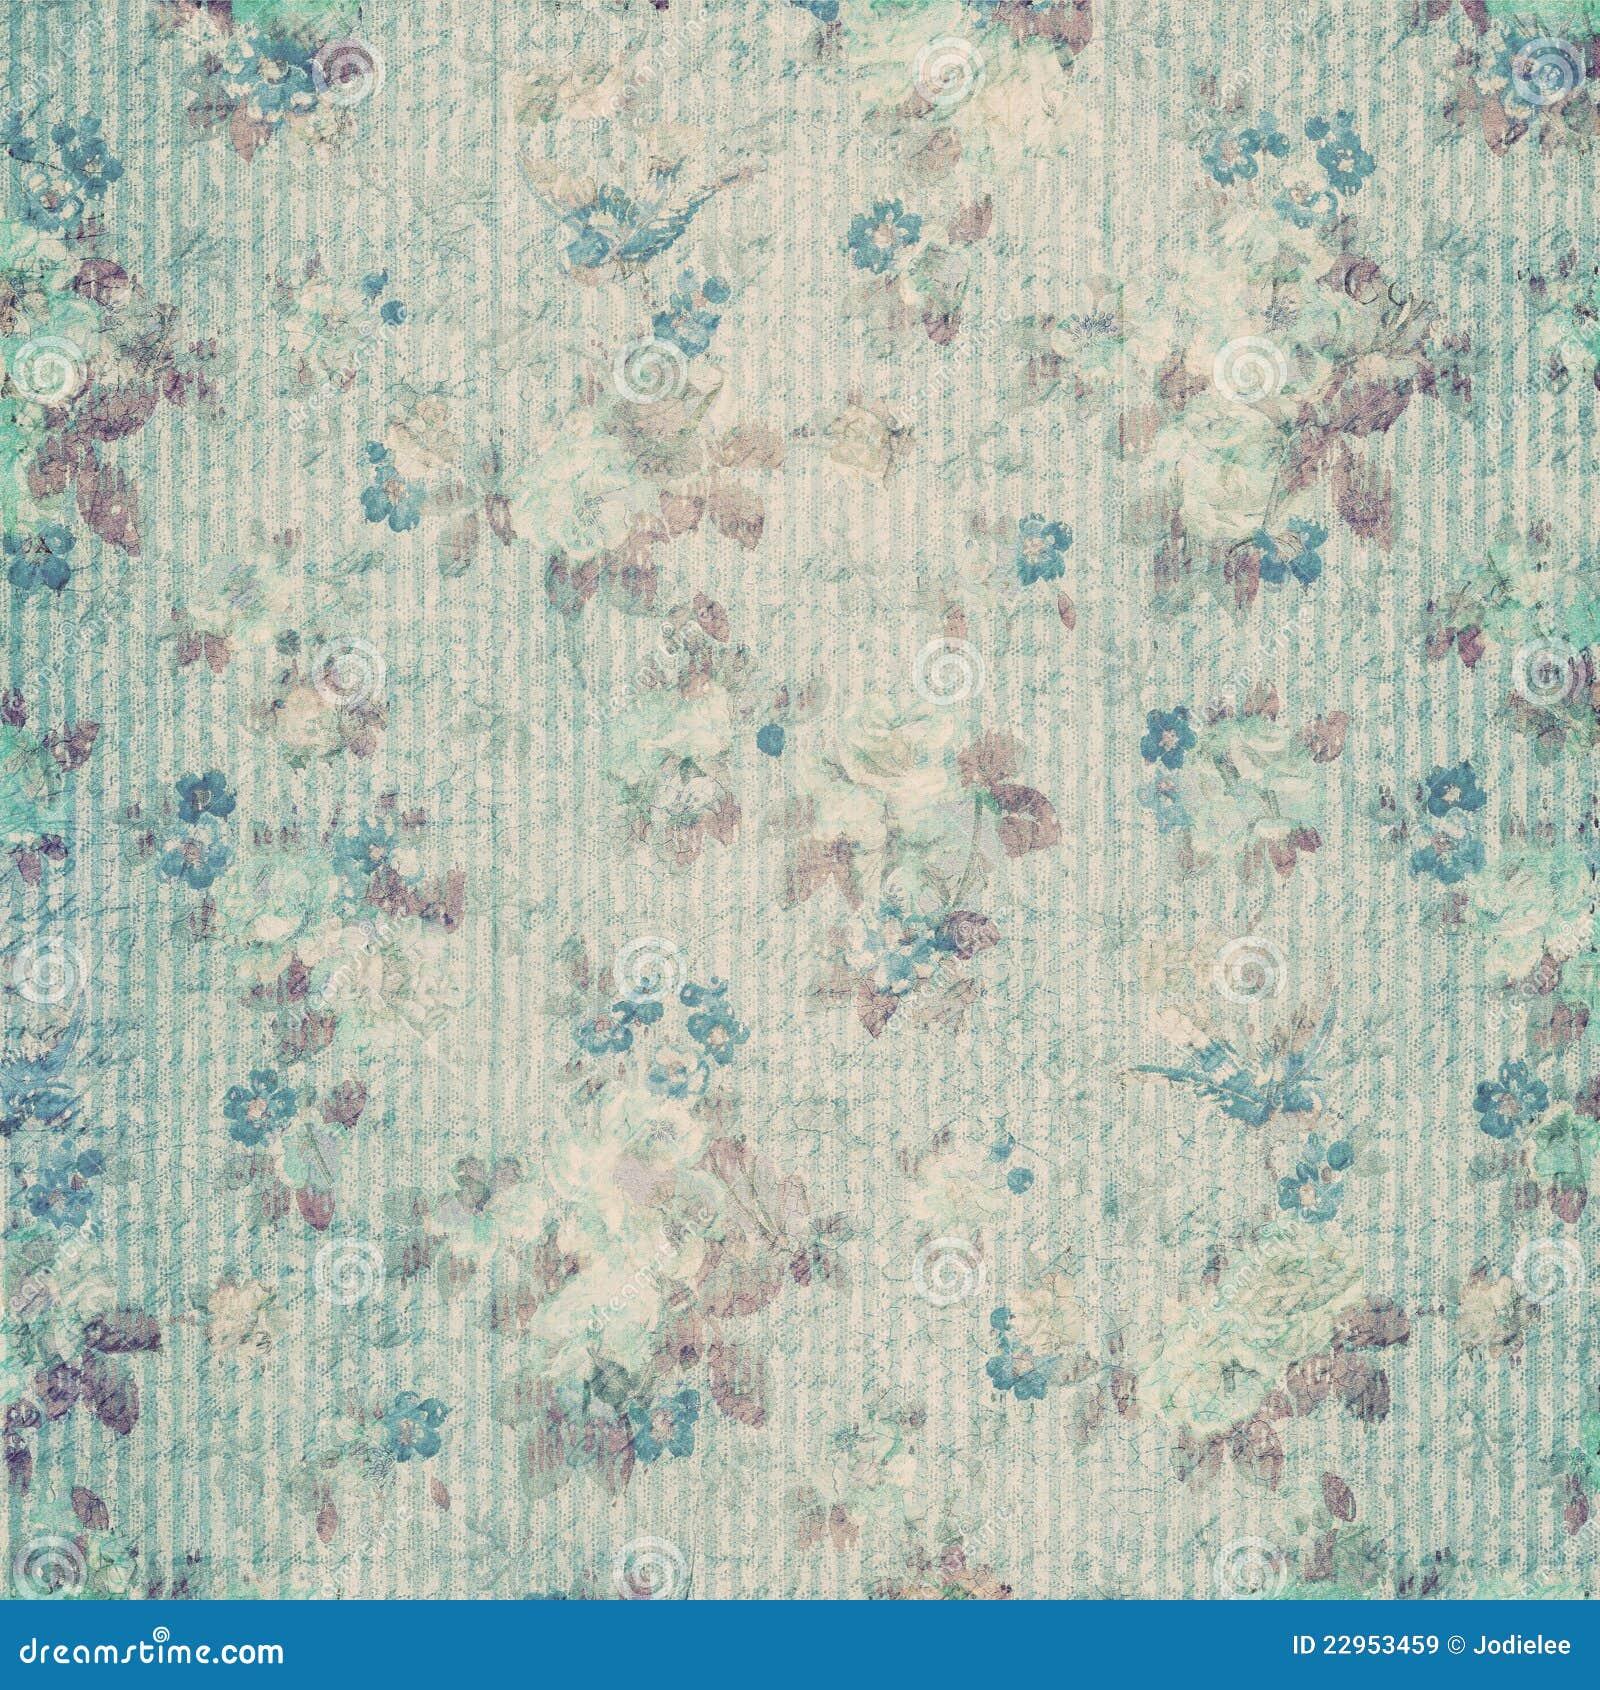 Scrapbook paper images - Blue Floral Shabby Chic Vintage Scrapbook Paper